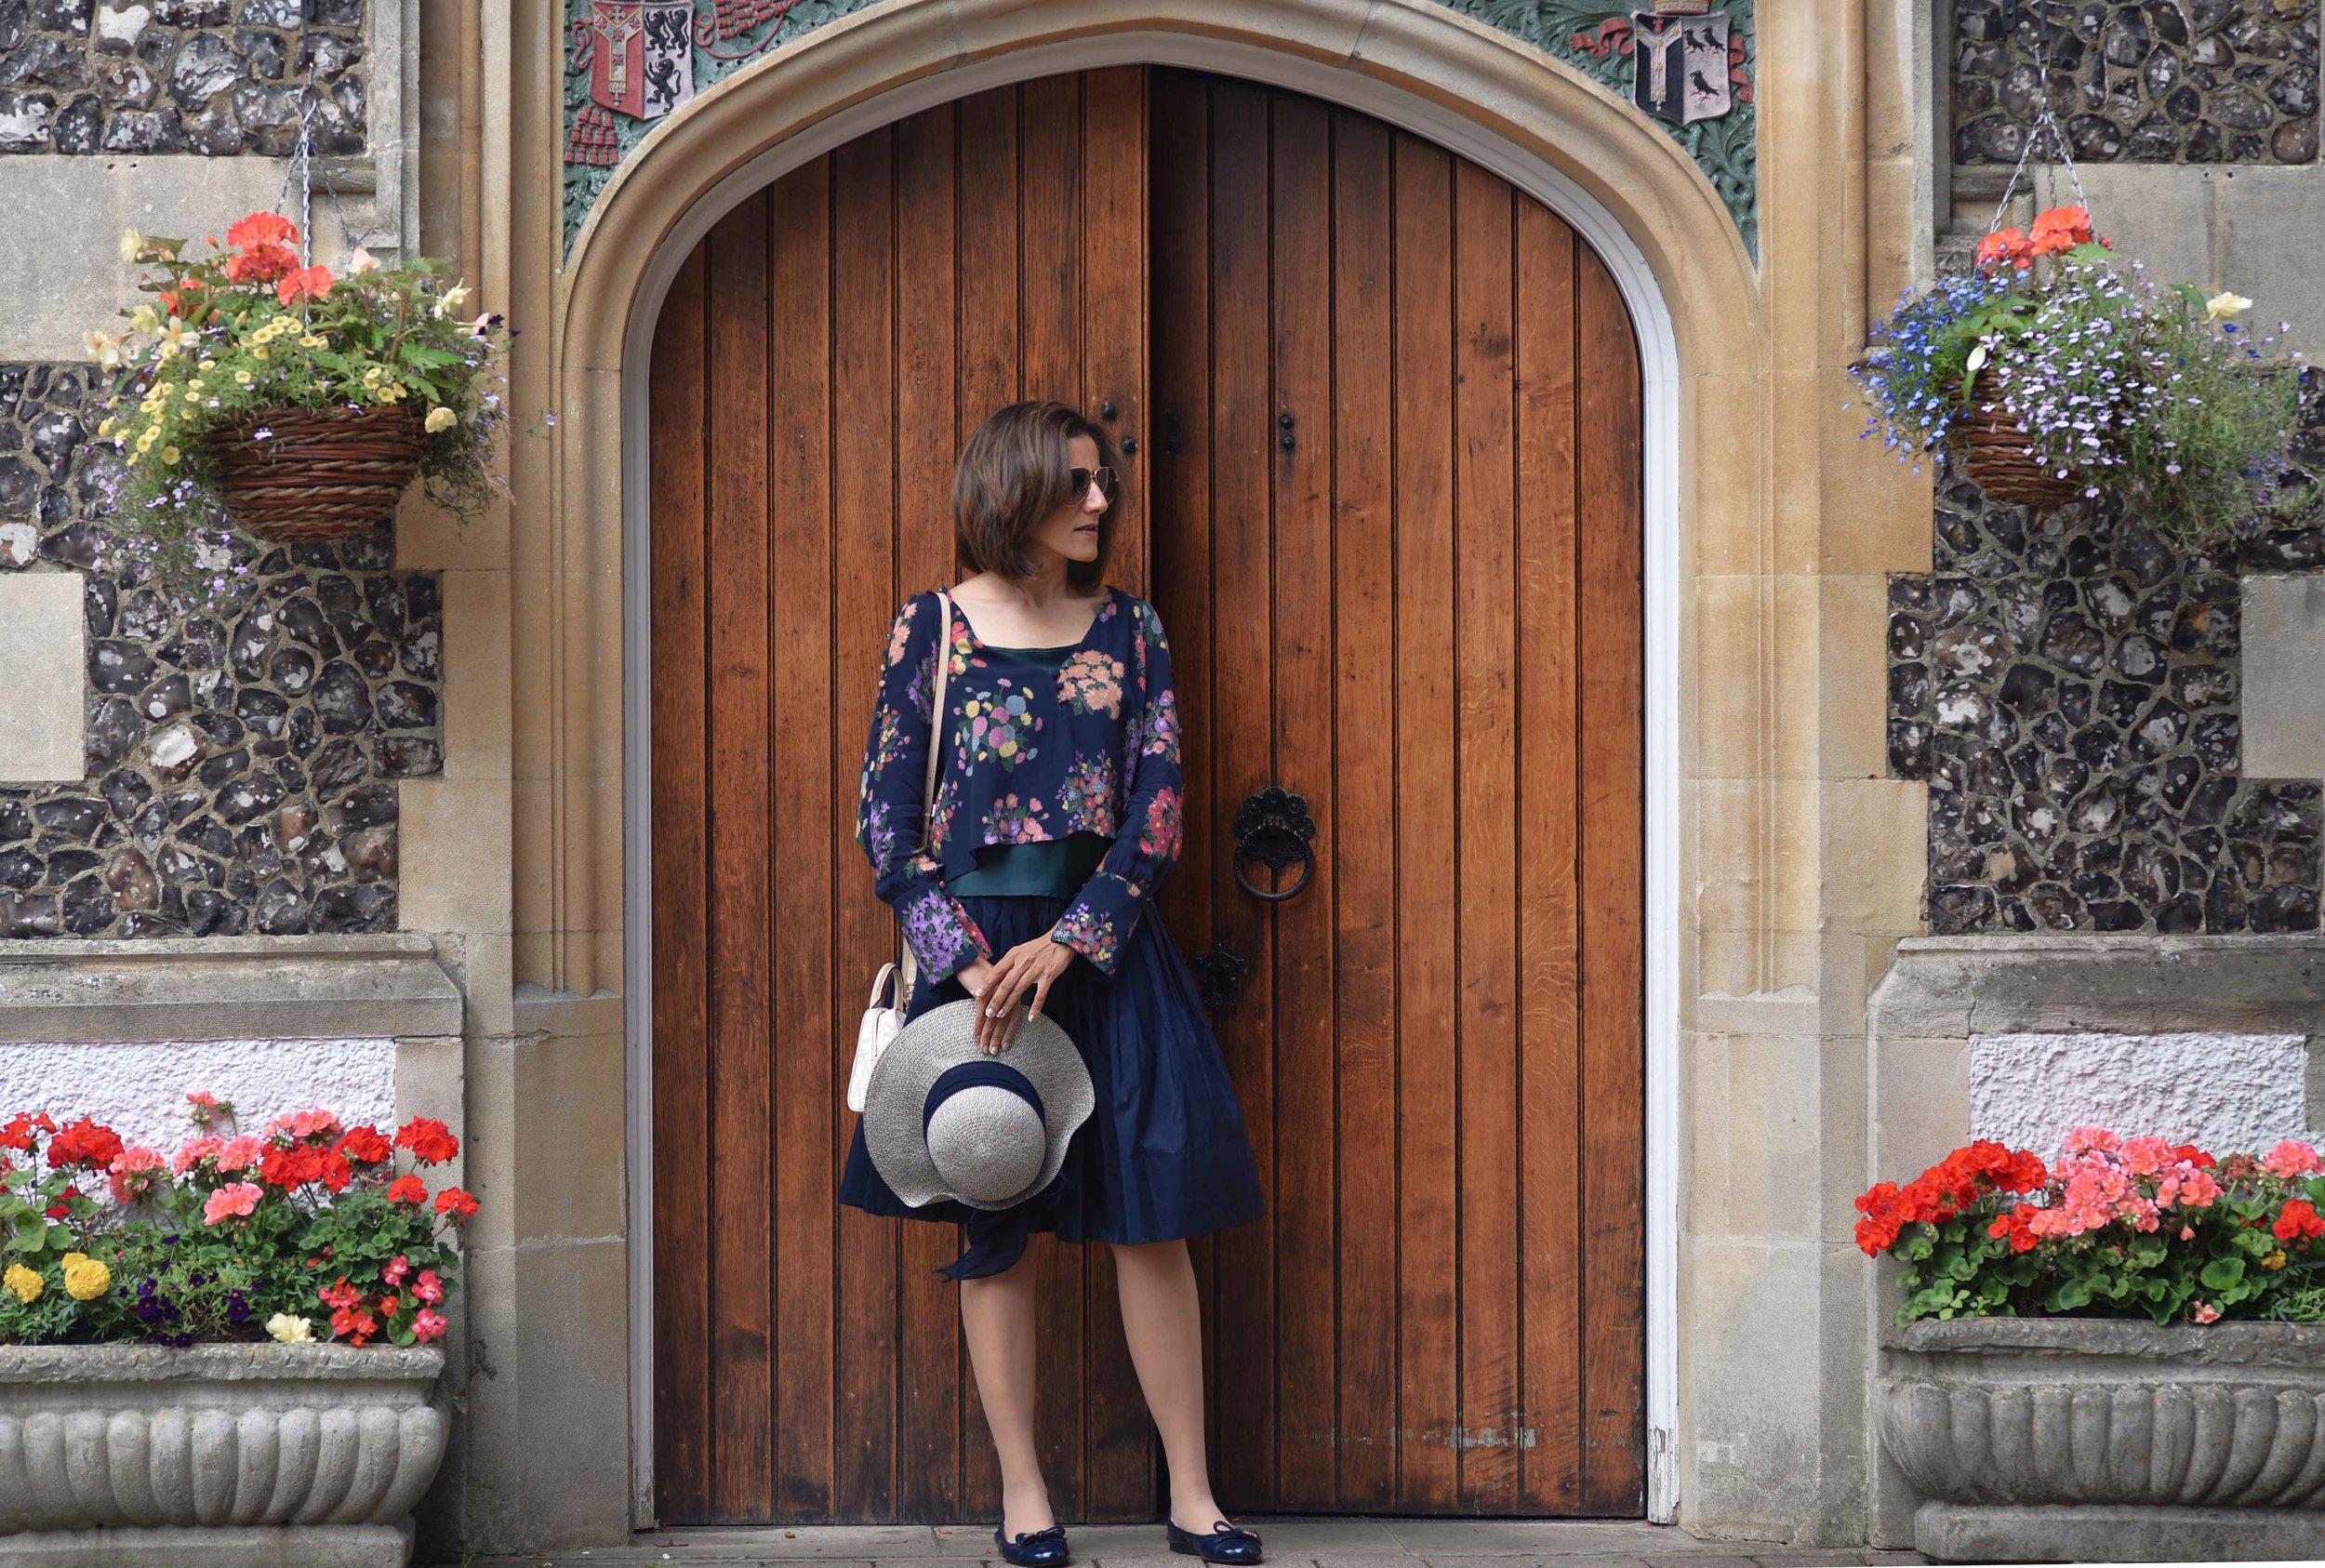 Zara floral top, Talbots silk Taffeta skirt, Talbots silk camisole, Prada ballet flats, M&S hat, Michael Kors bag. Image©sourcingstyle.com